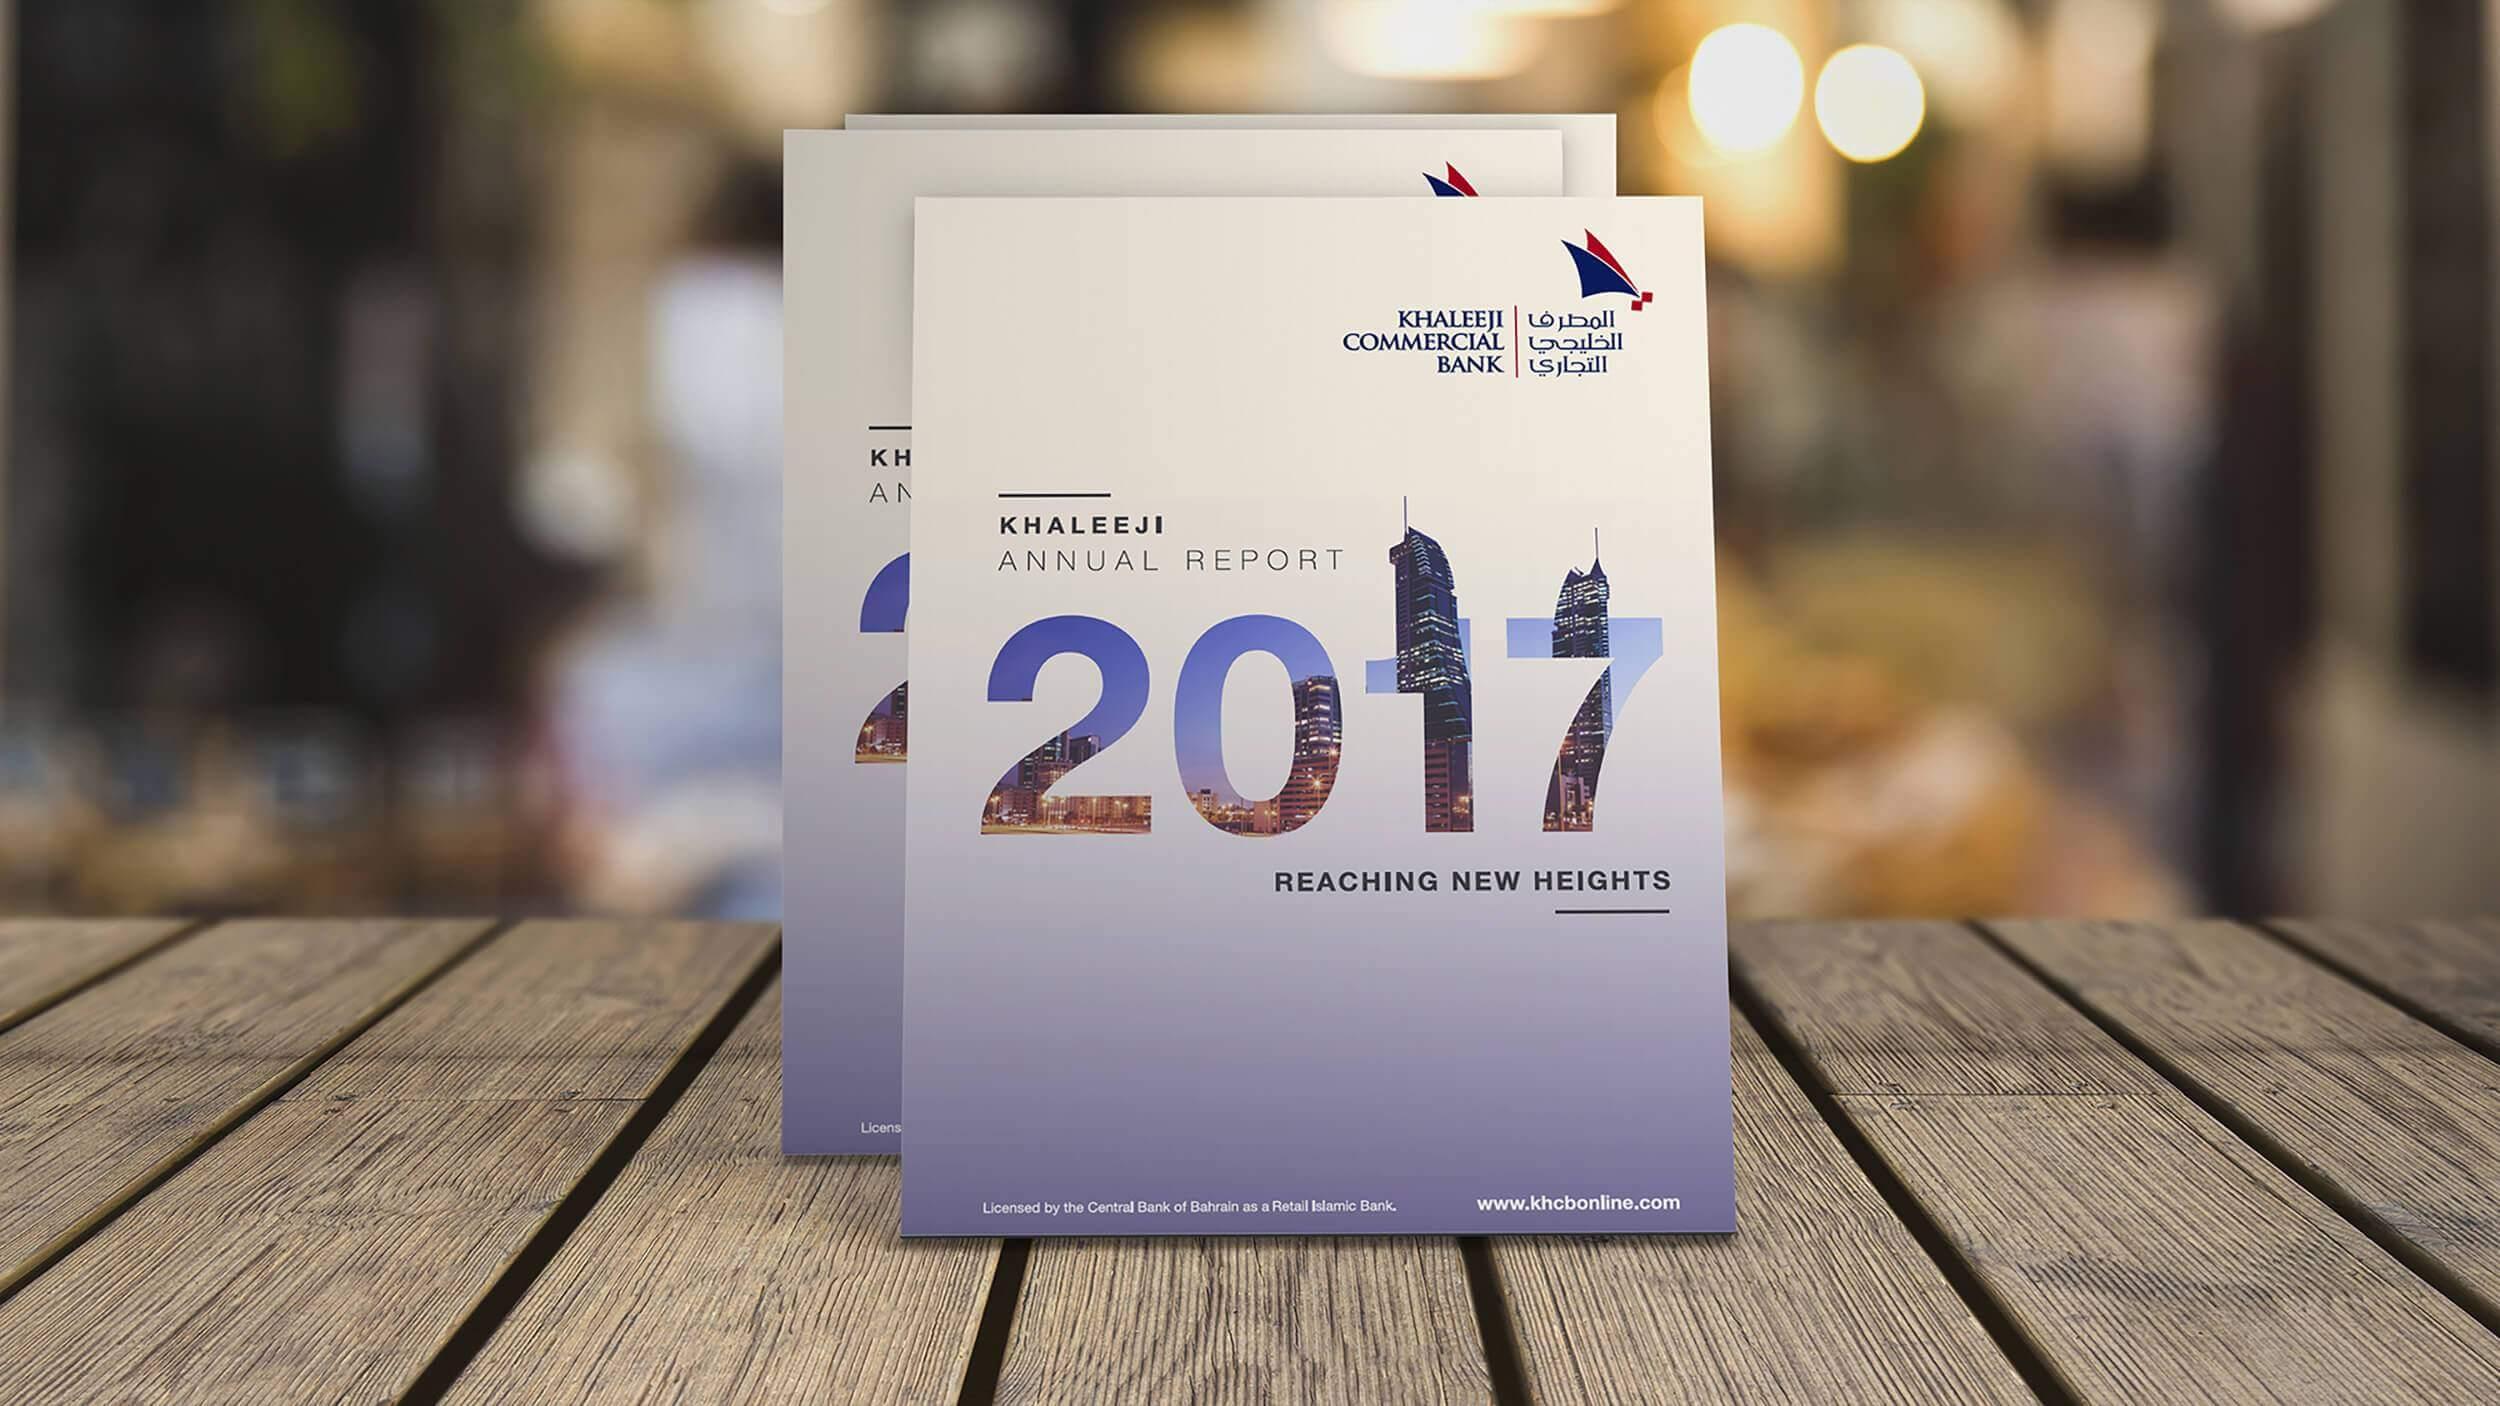 KHCB Annual Report